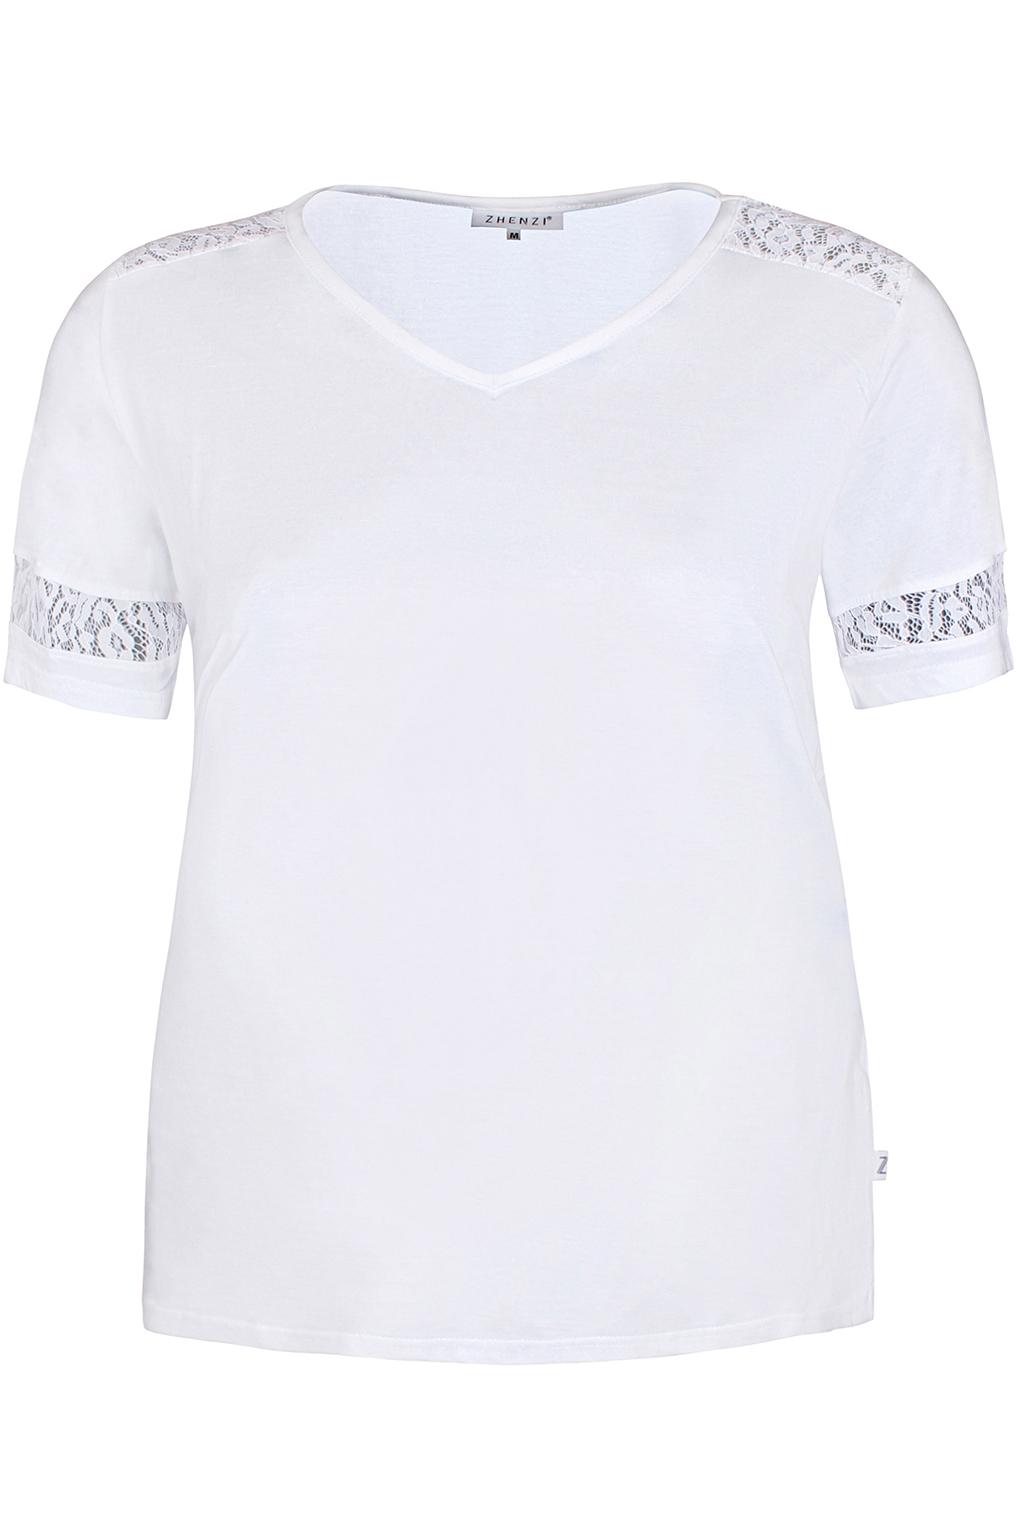 Shirt ALBERTA Zhenzi kant details